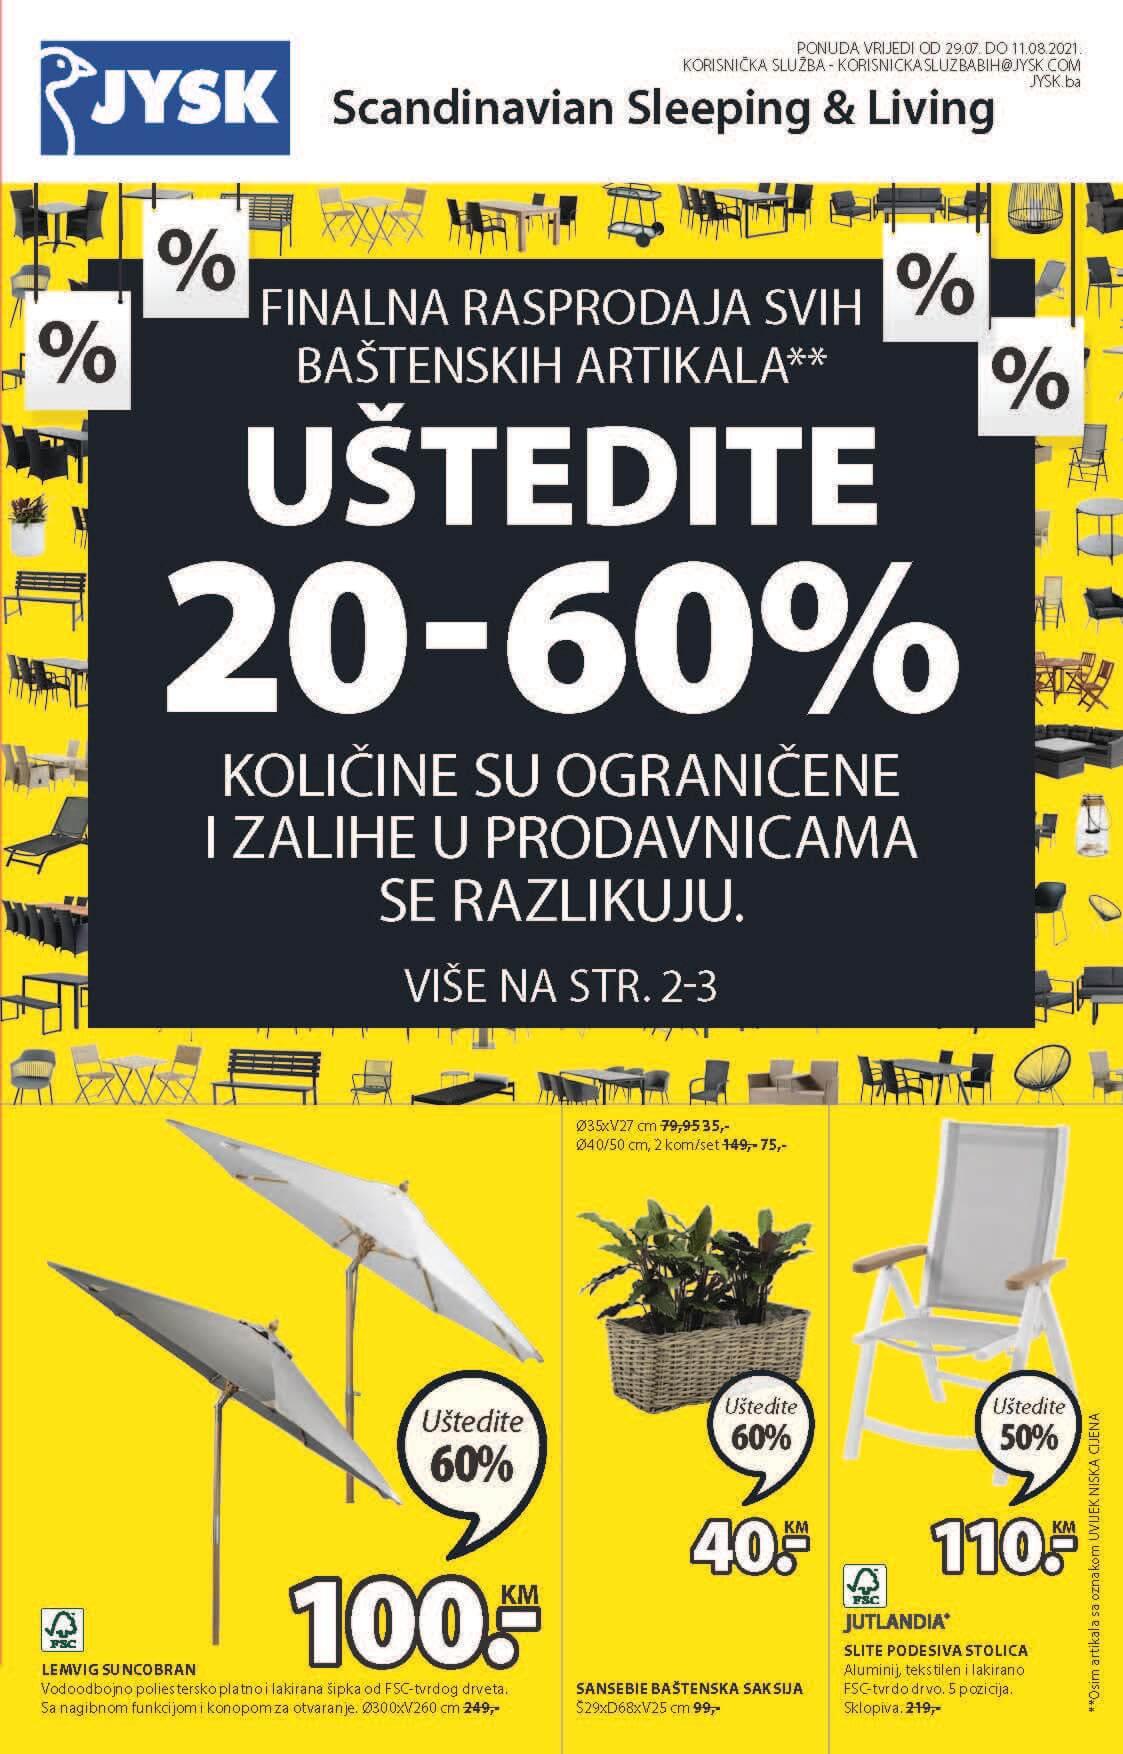 JYSK Katalog Akcijska rasprodaja AVGUST 2021 29.7.2021. 11.8.2021. Page 02